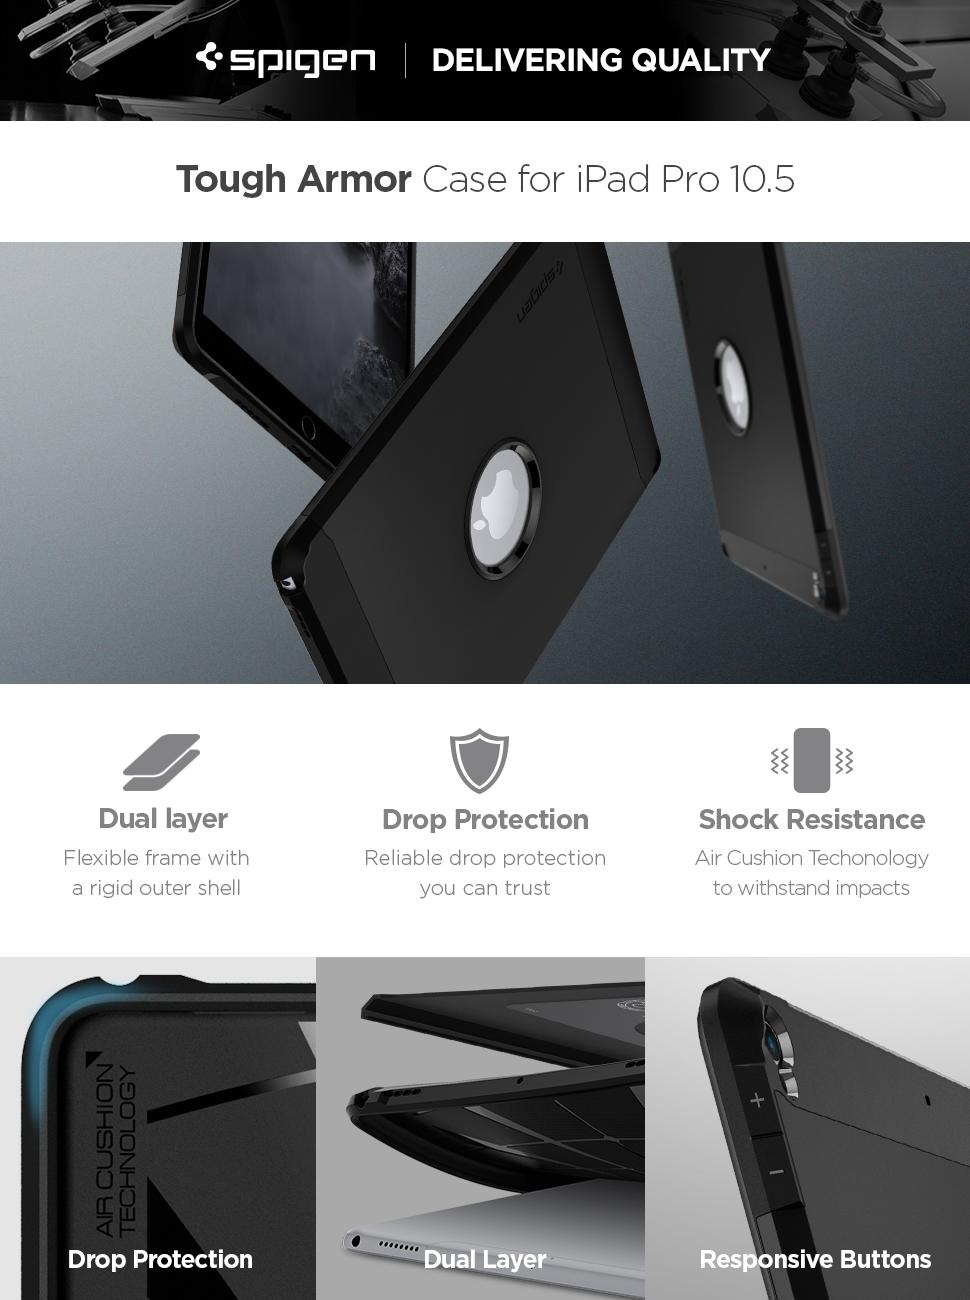 reputable site 9a467 f8e94 Spigen Tough Armor Designed for iPad Pro 10.5 Case (2017) - Black